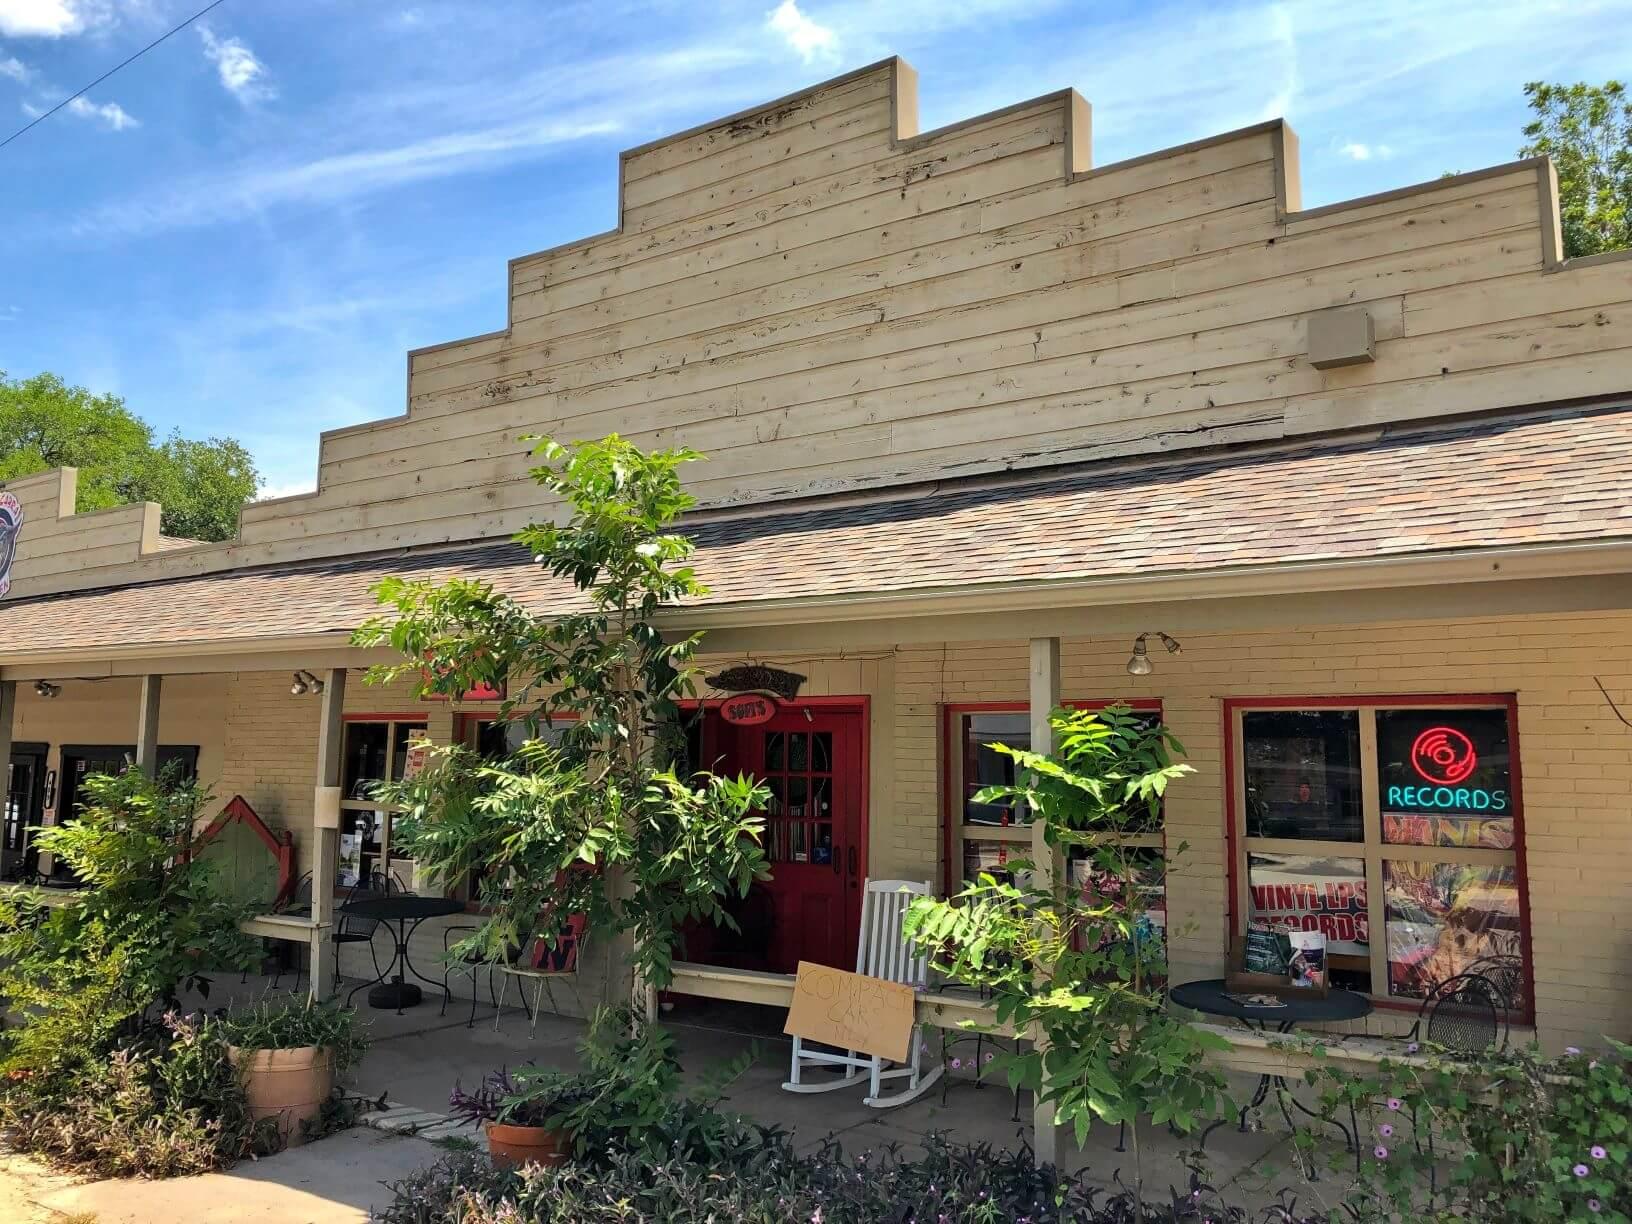 Salado: A Huge Jewel in the Crown of Texas   A Wandering Web